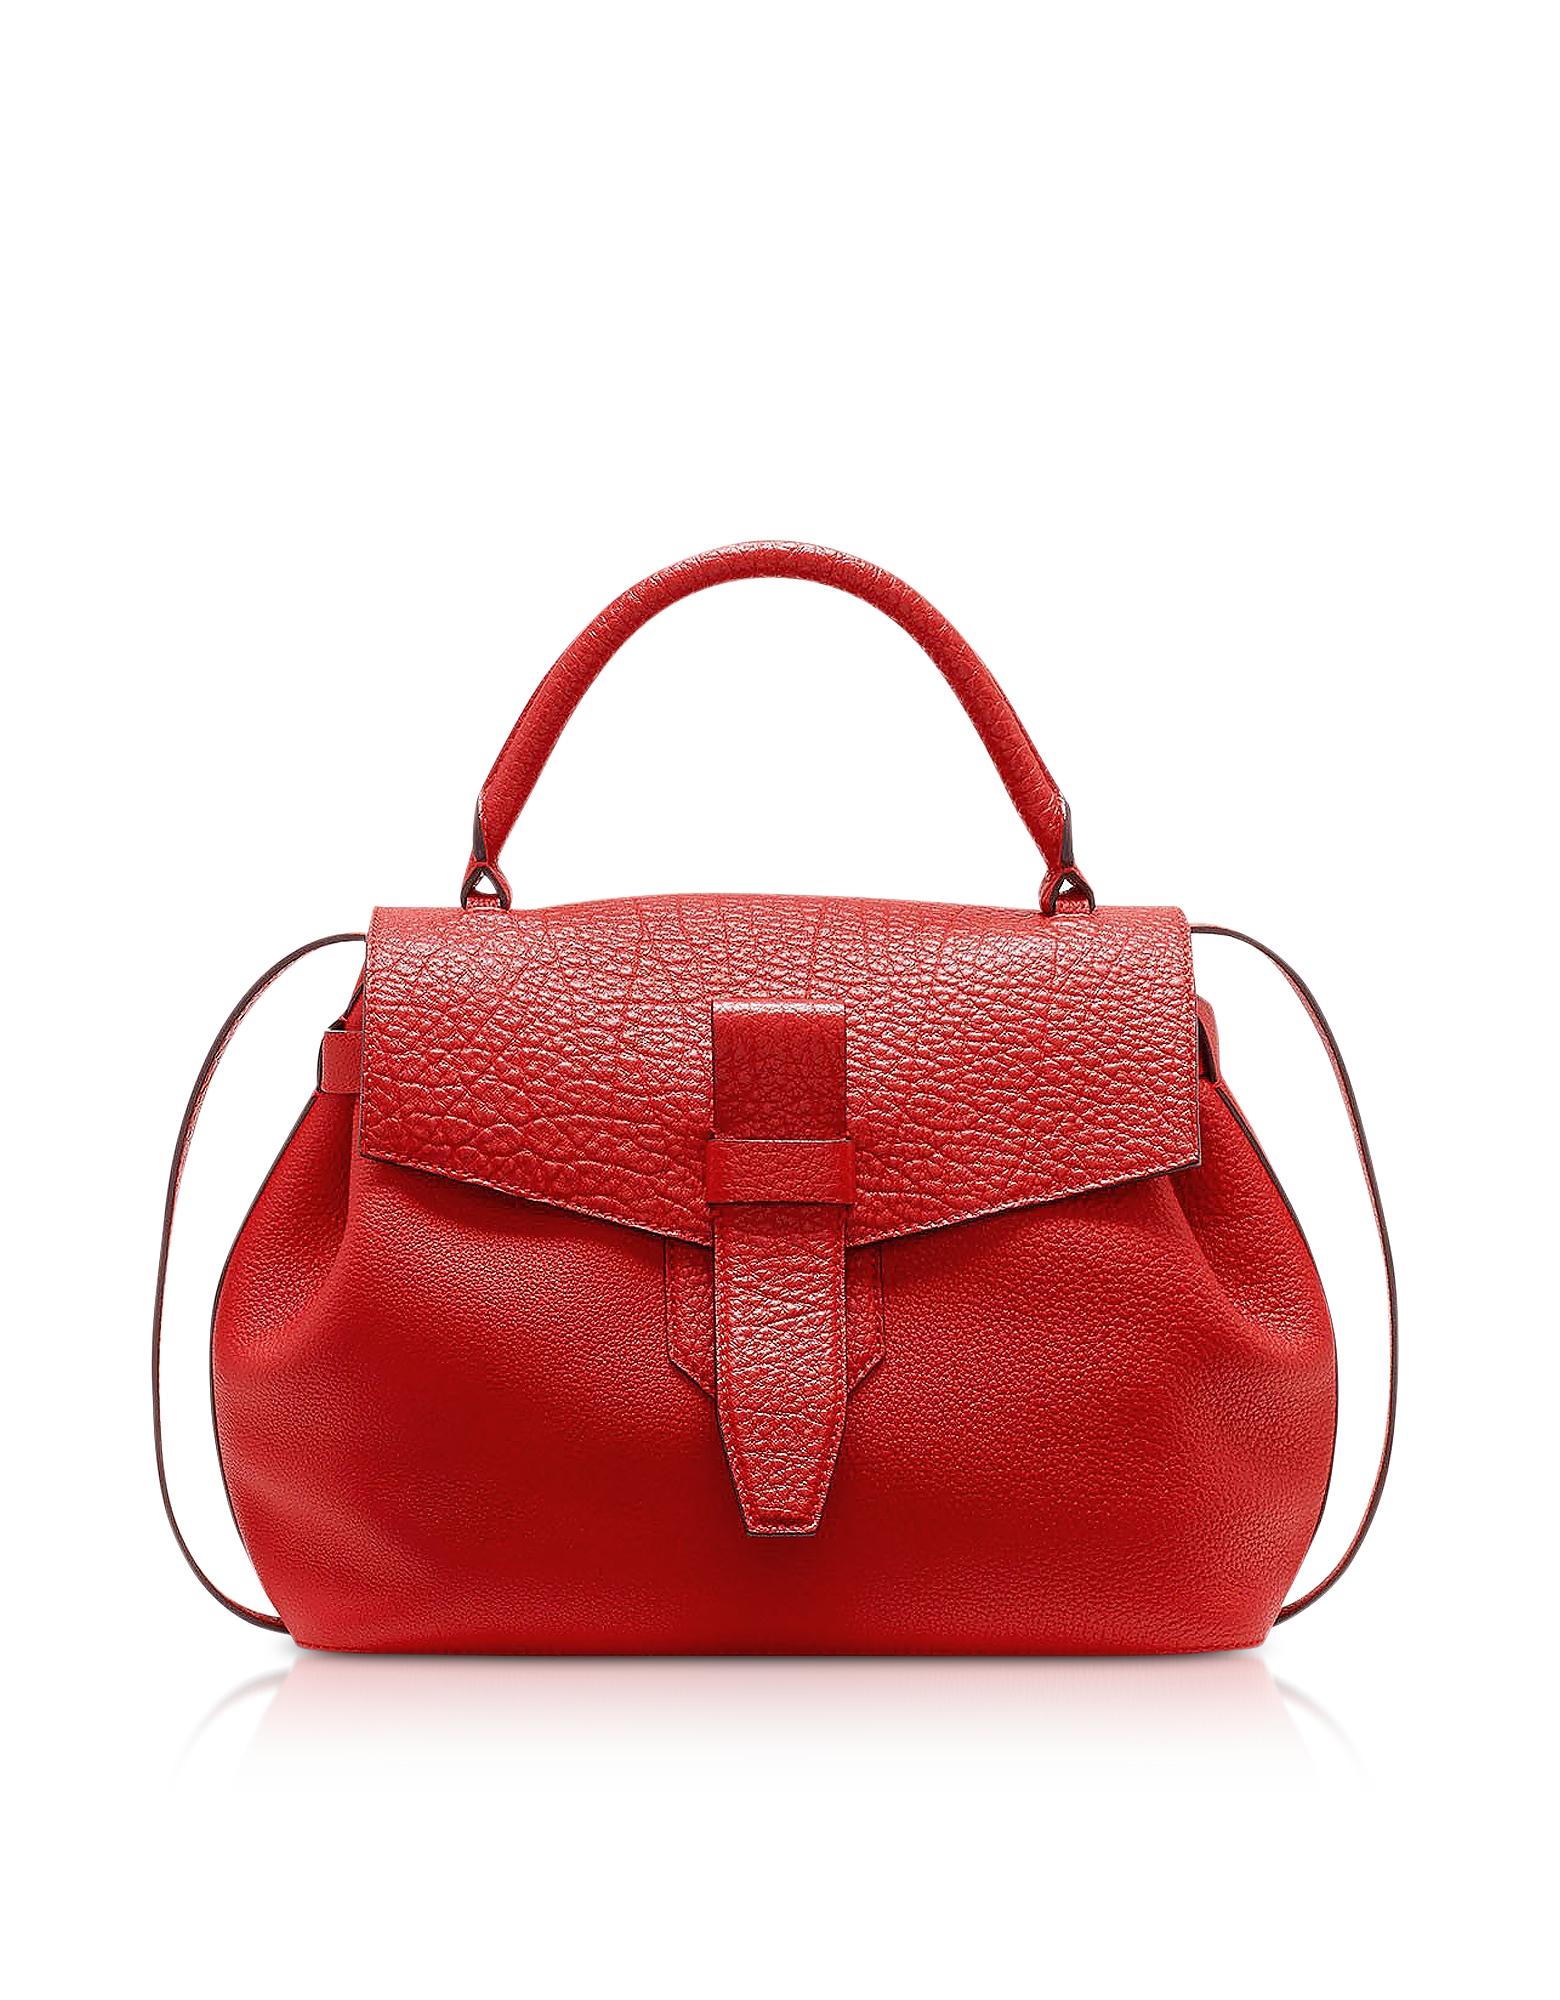 Image of Lancel Designer Handbags, Charlie Medium Grained Leather Handbag